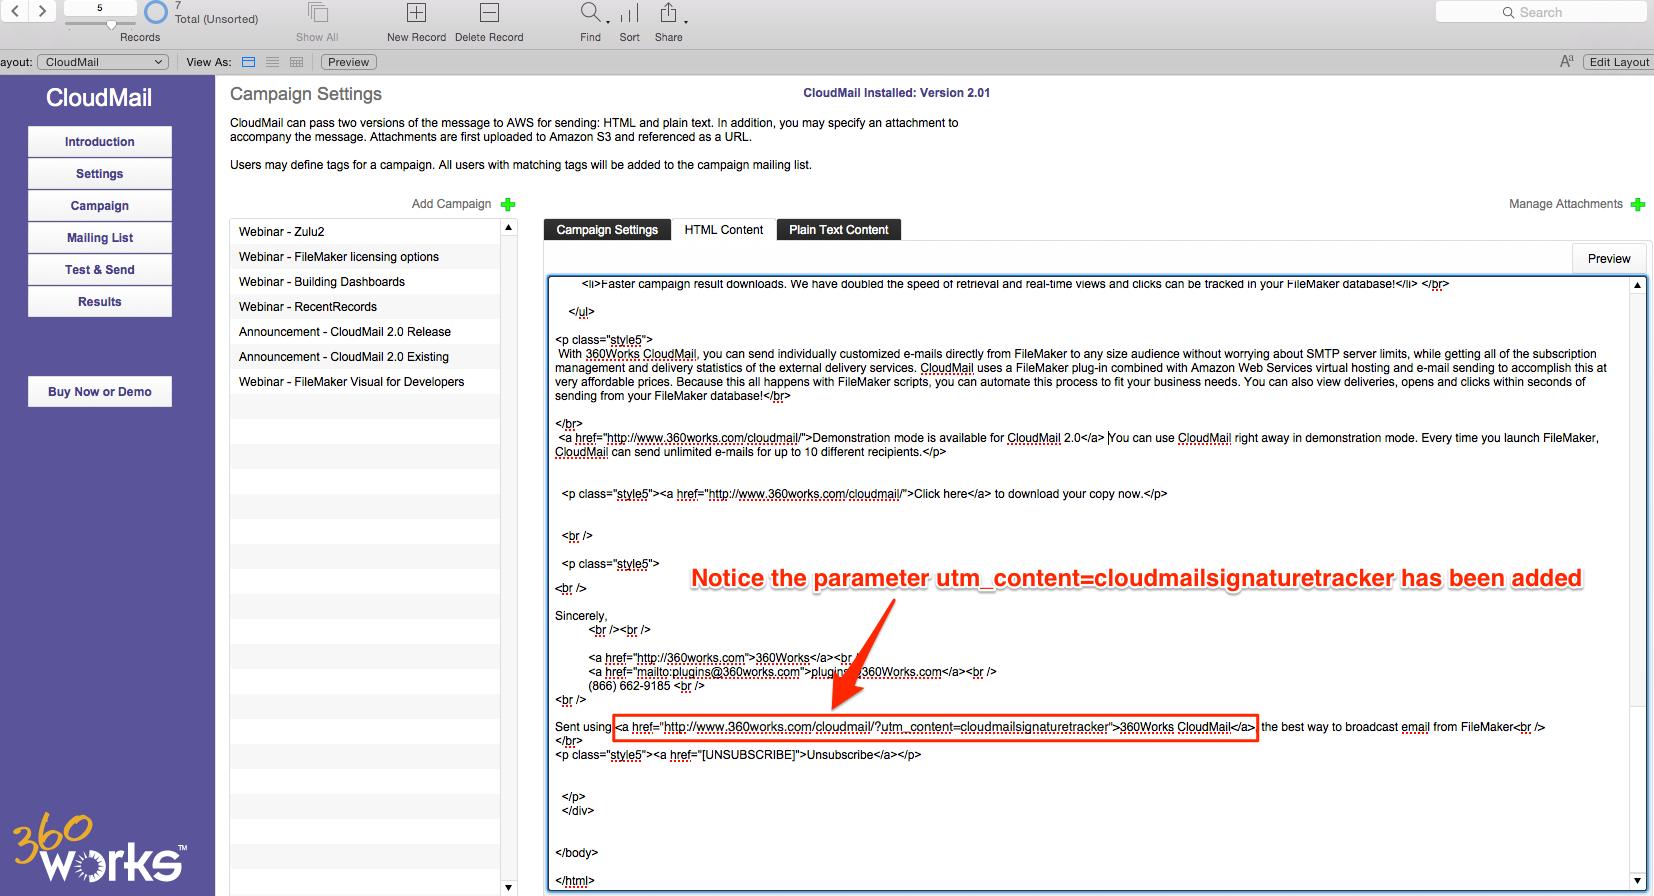 cloudmail add parameters